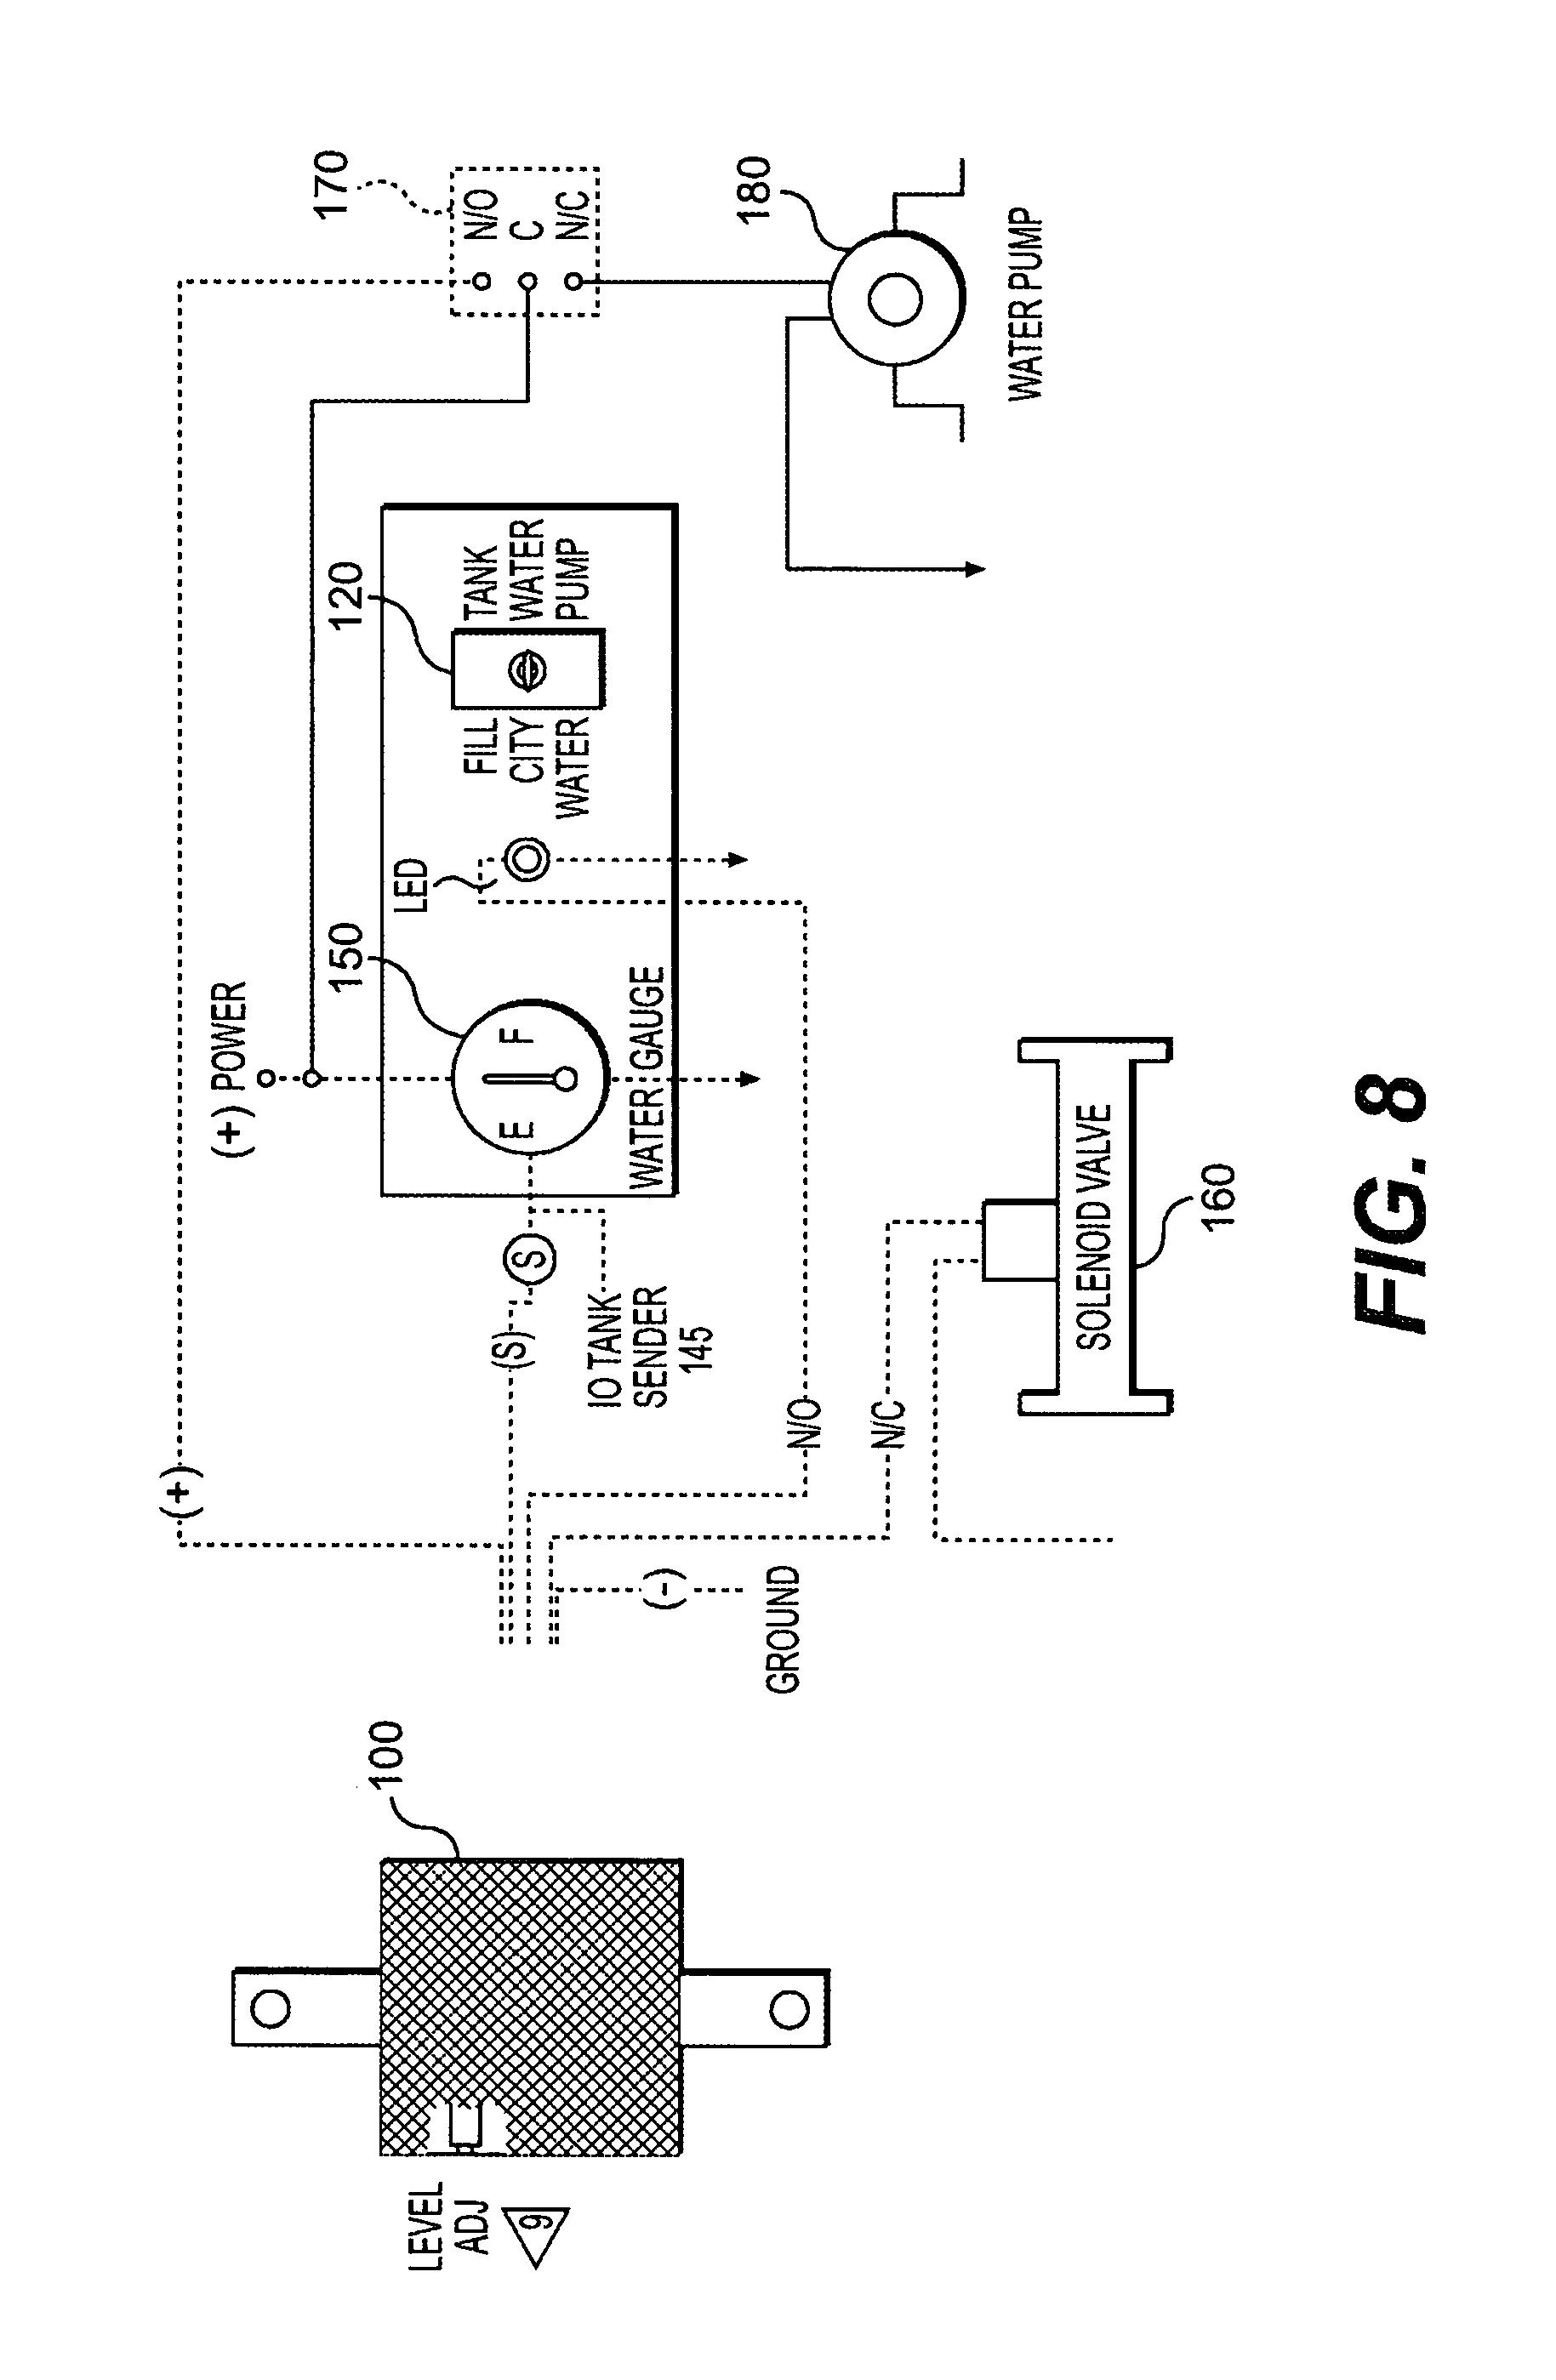 Tank Level Alarm System Wiring Diagram Best Secret Motorcycle Sje Rhombus 26 Images Silencer Car